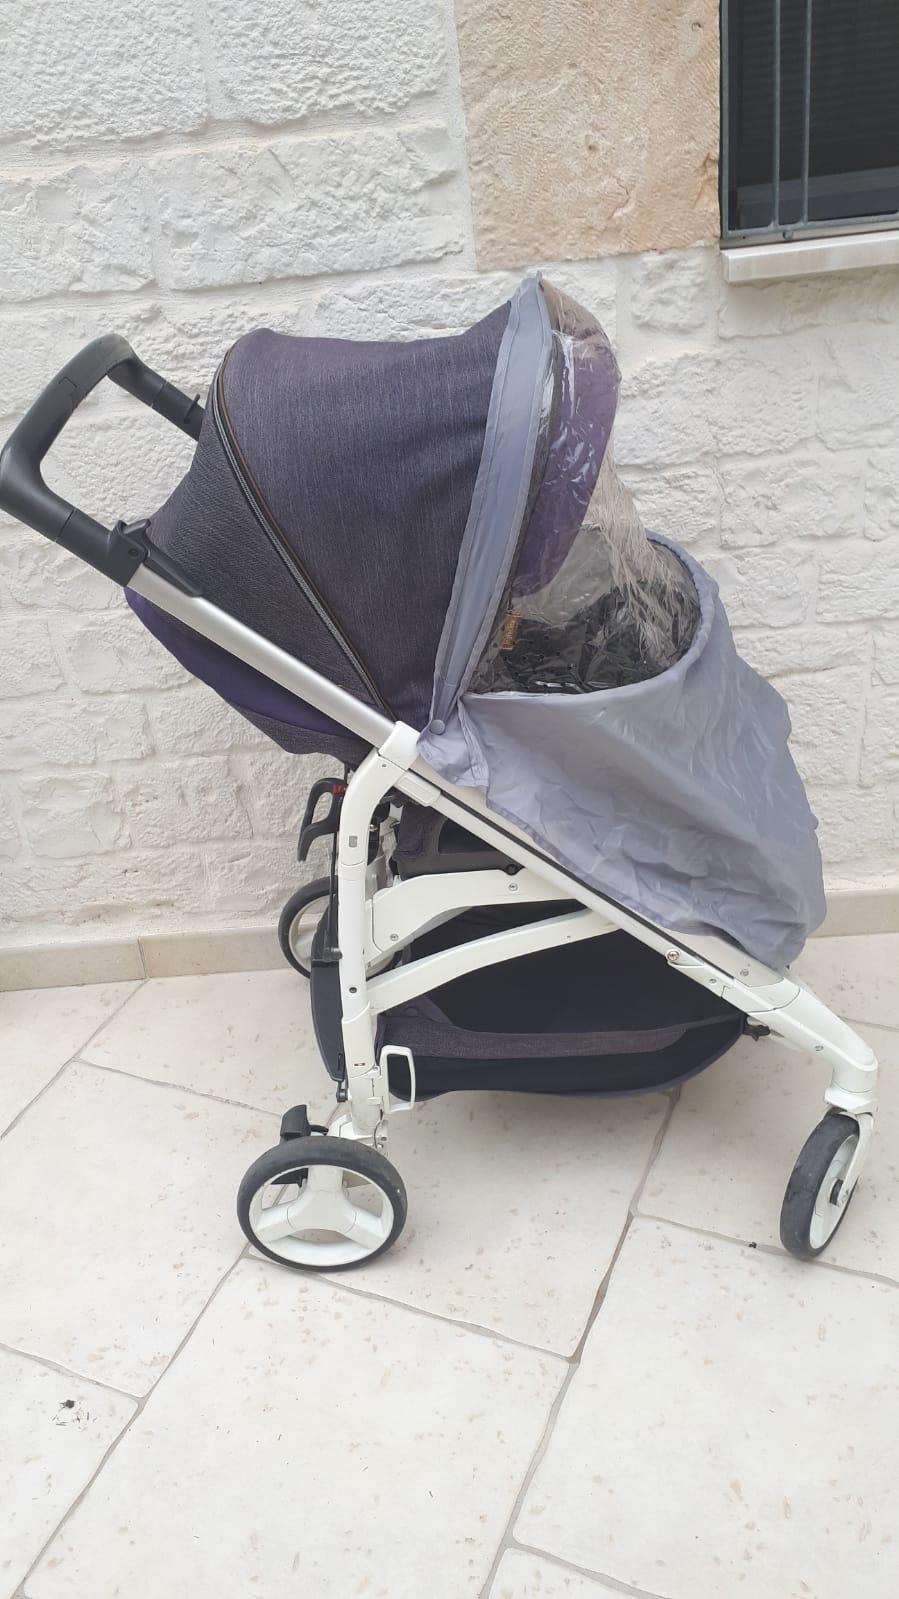 Rent stroller rain cover Putignano